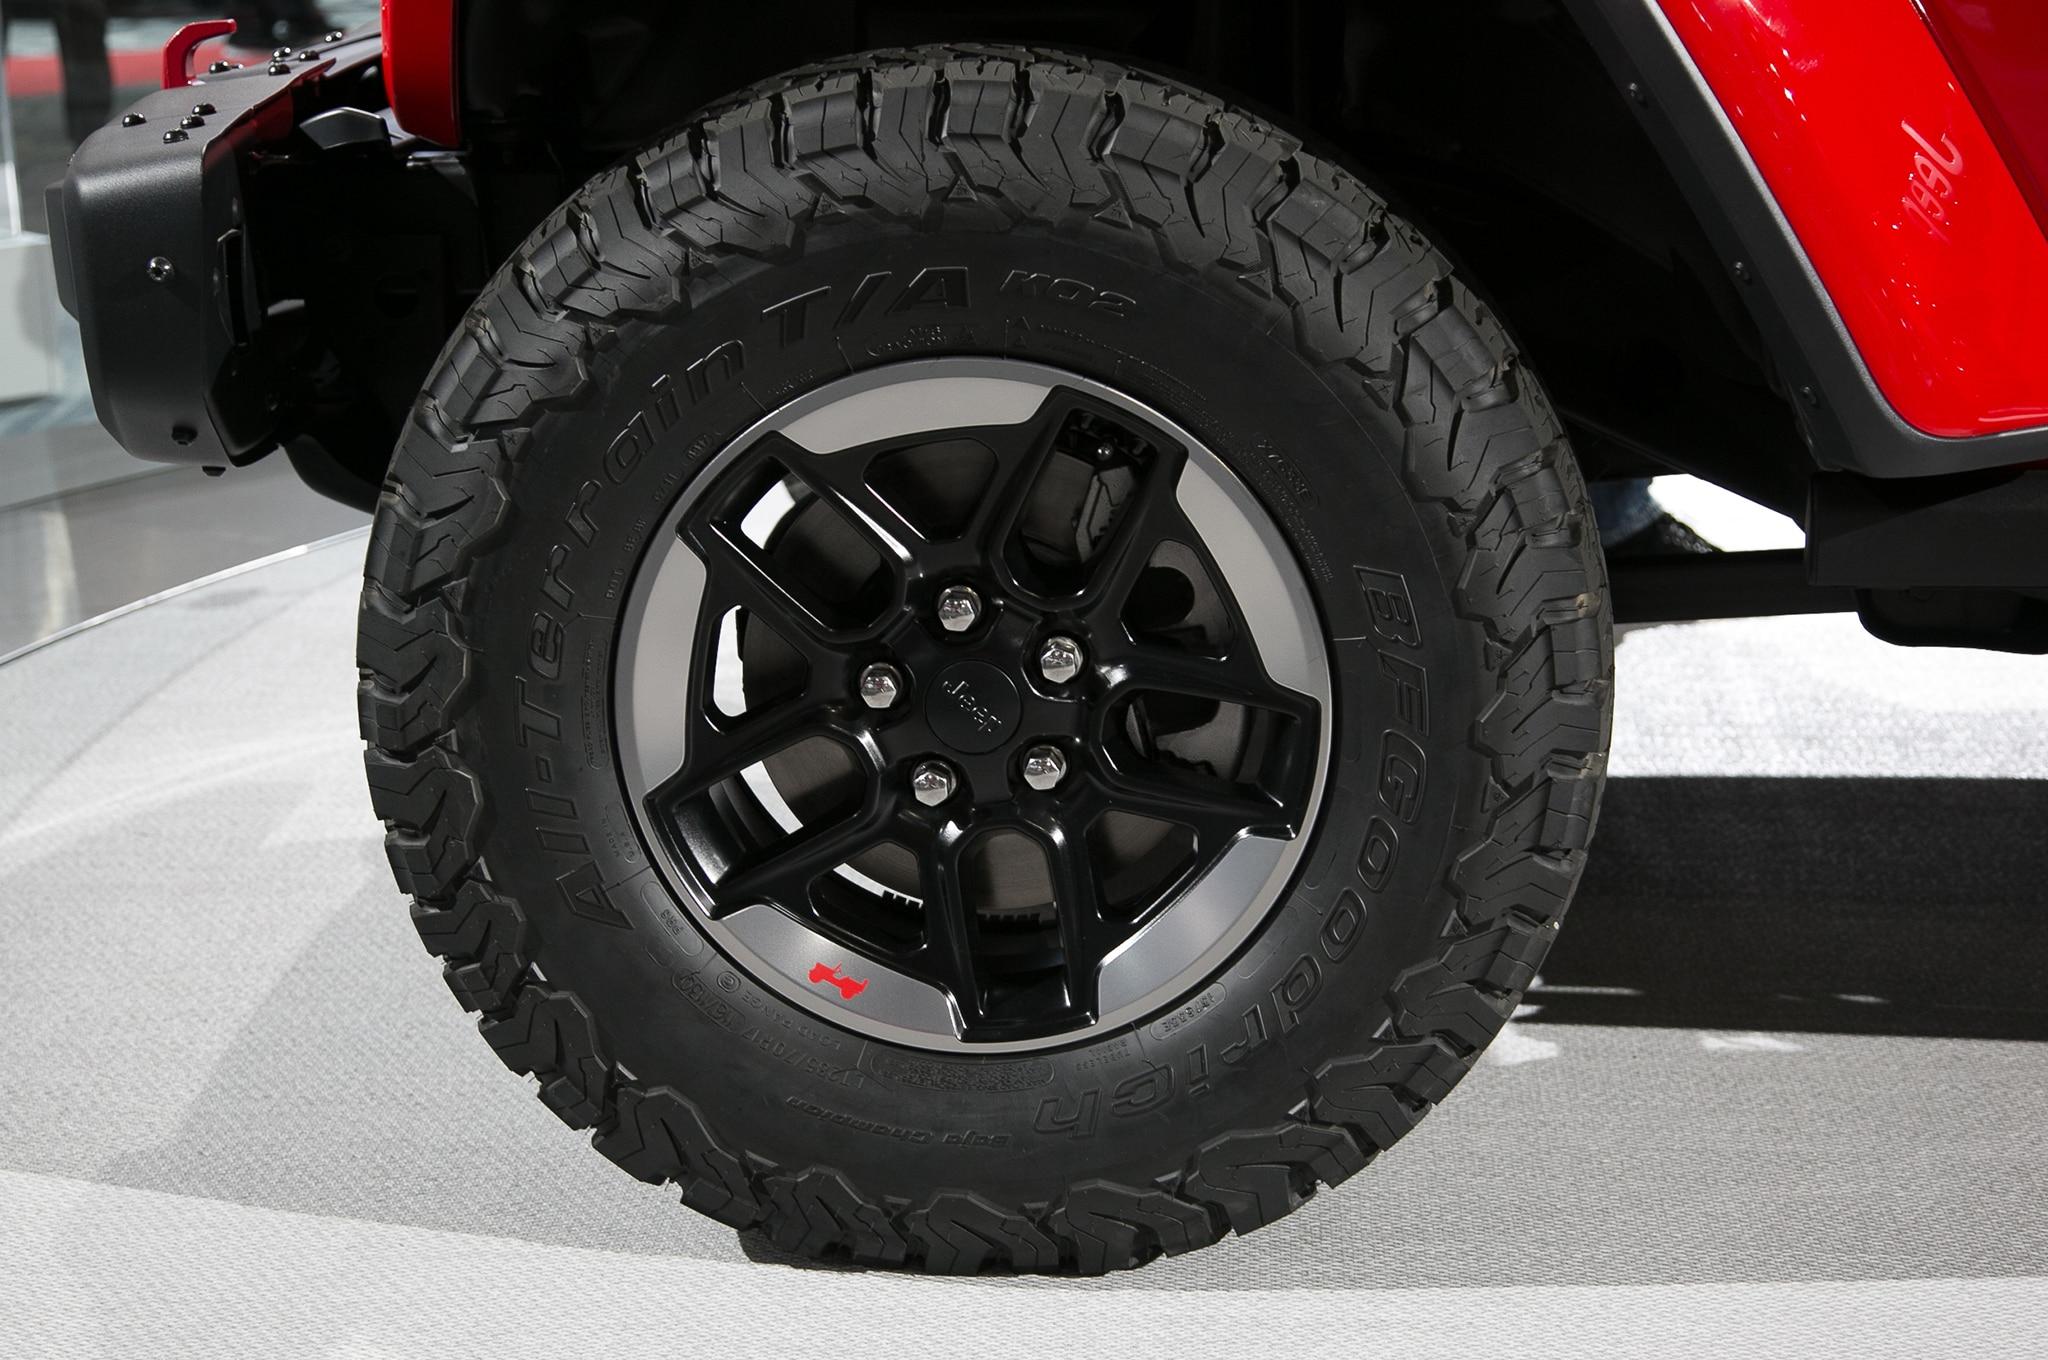 2018 Jeep Wrangler tire - Motor Trend en Español